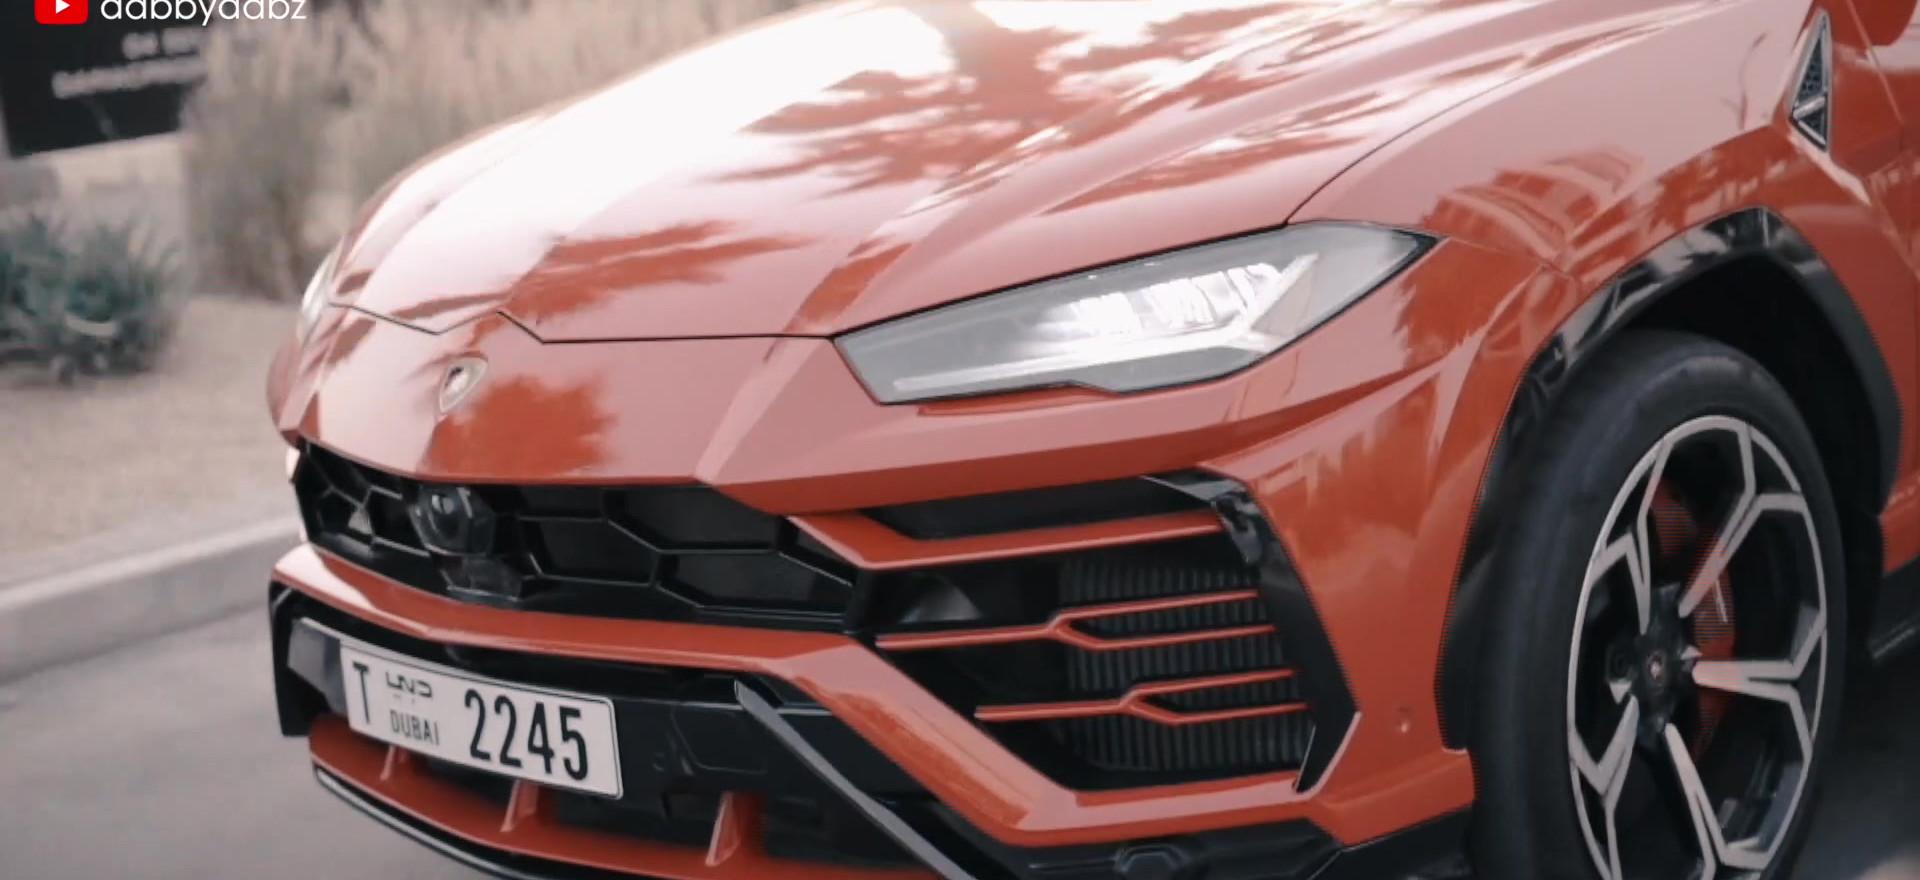 Dubai Luxury Life & Cars Social Media Campaign Video